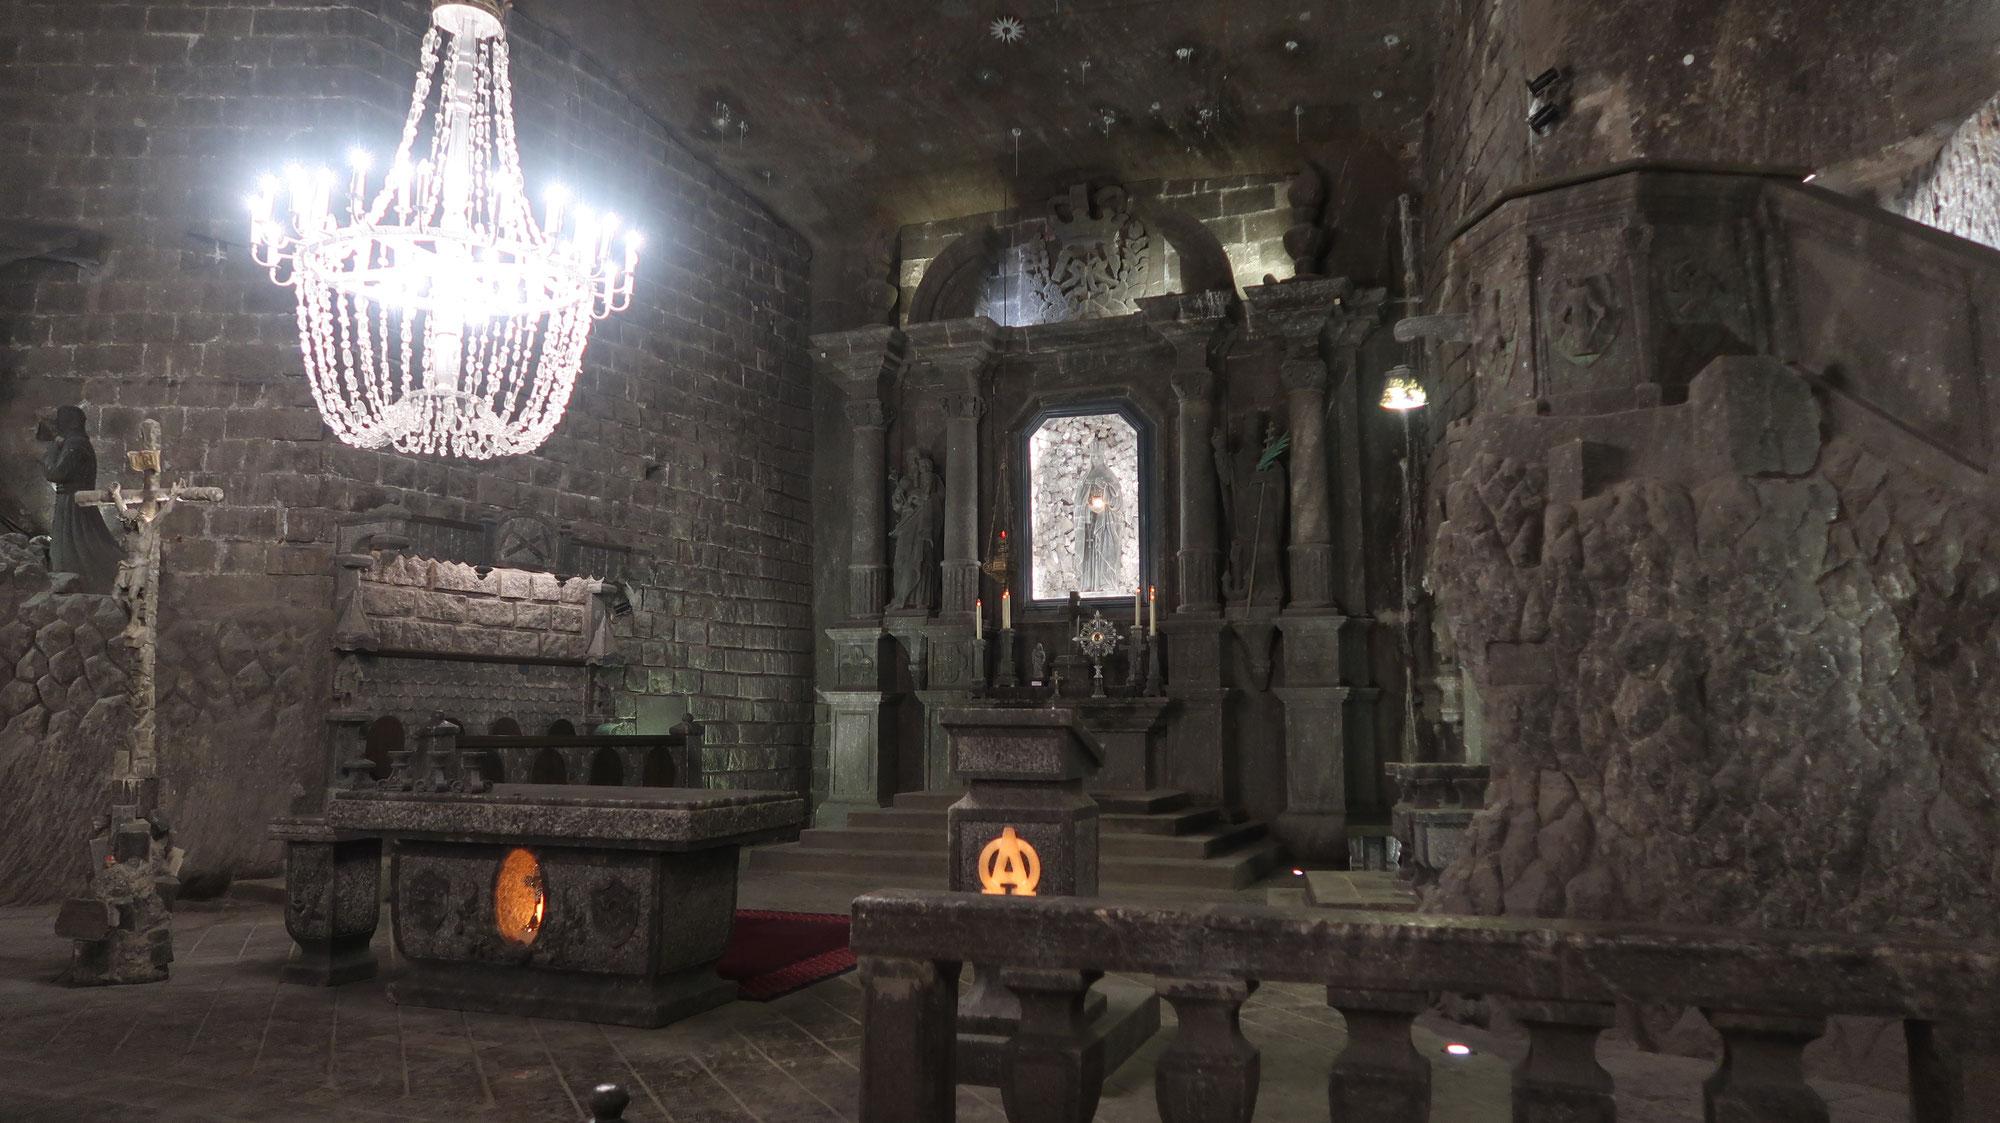 La traversée de la Pologne - La mine de Wieliczka